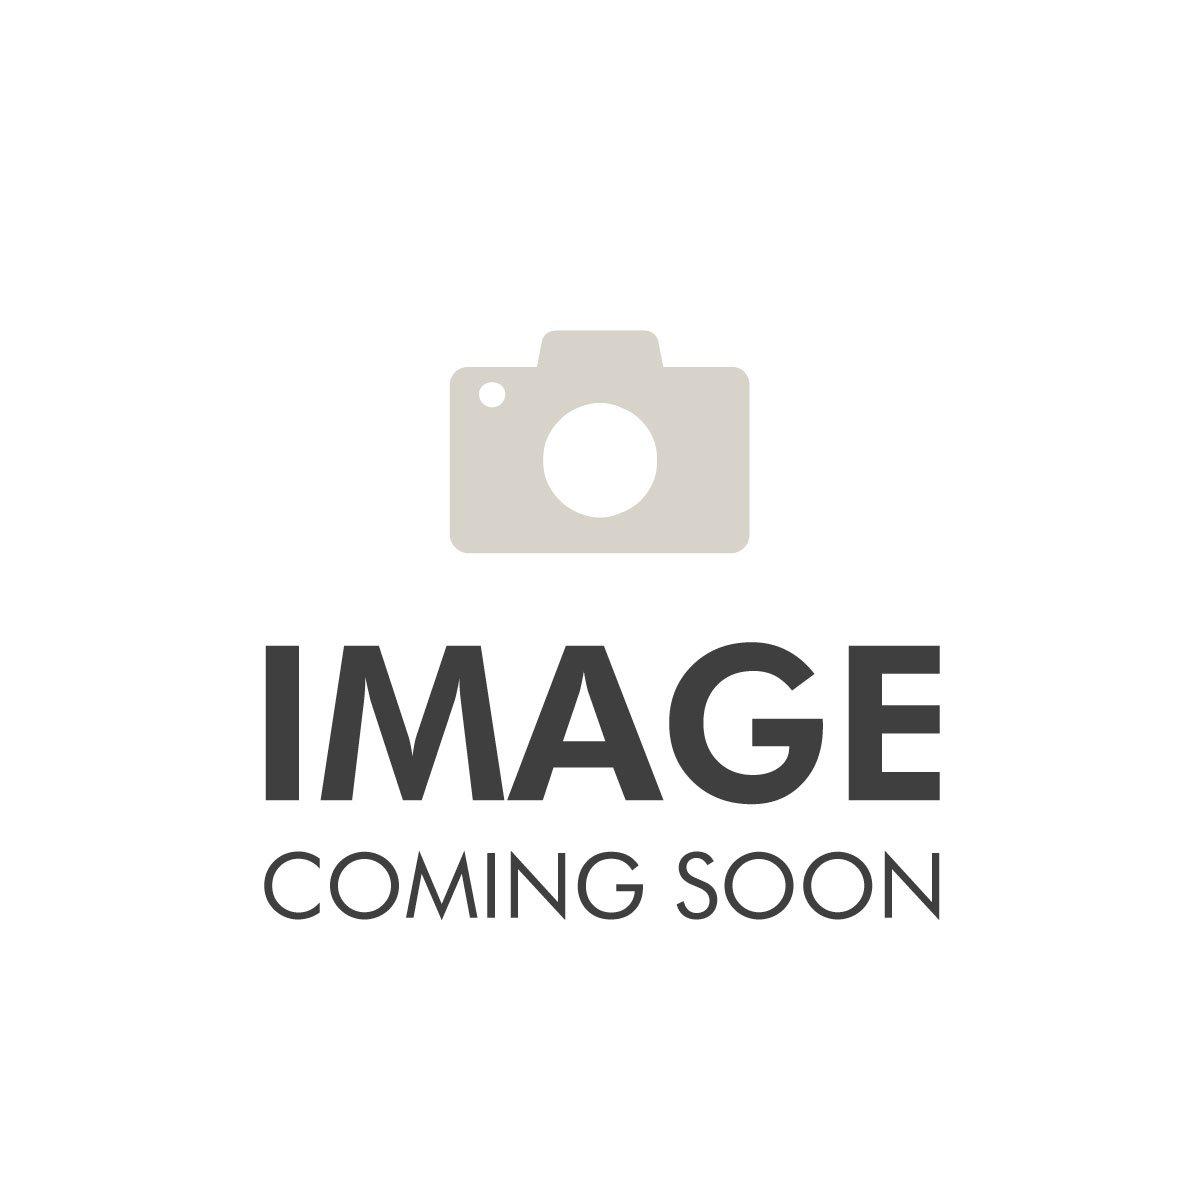 Gres Cabotine 30ml Eau De Toilette Spray